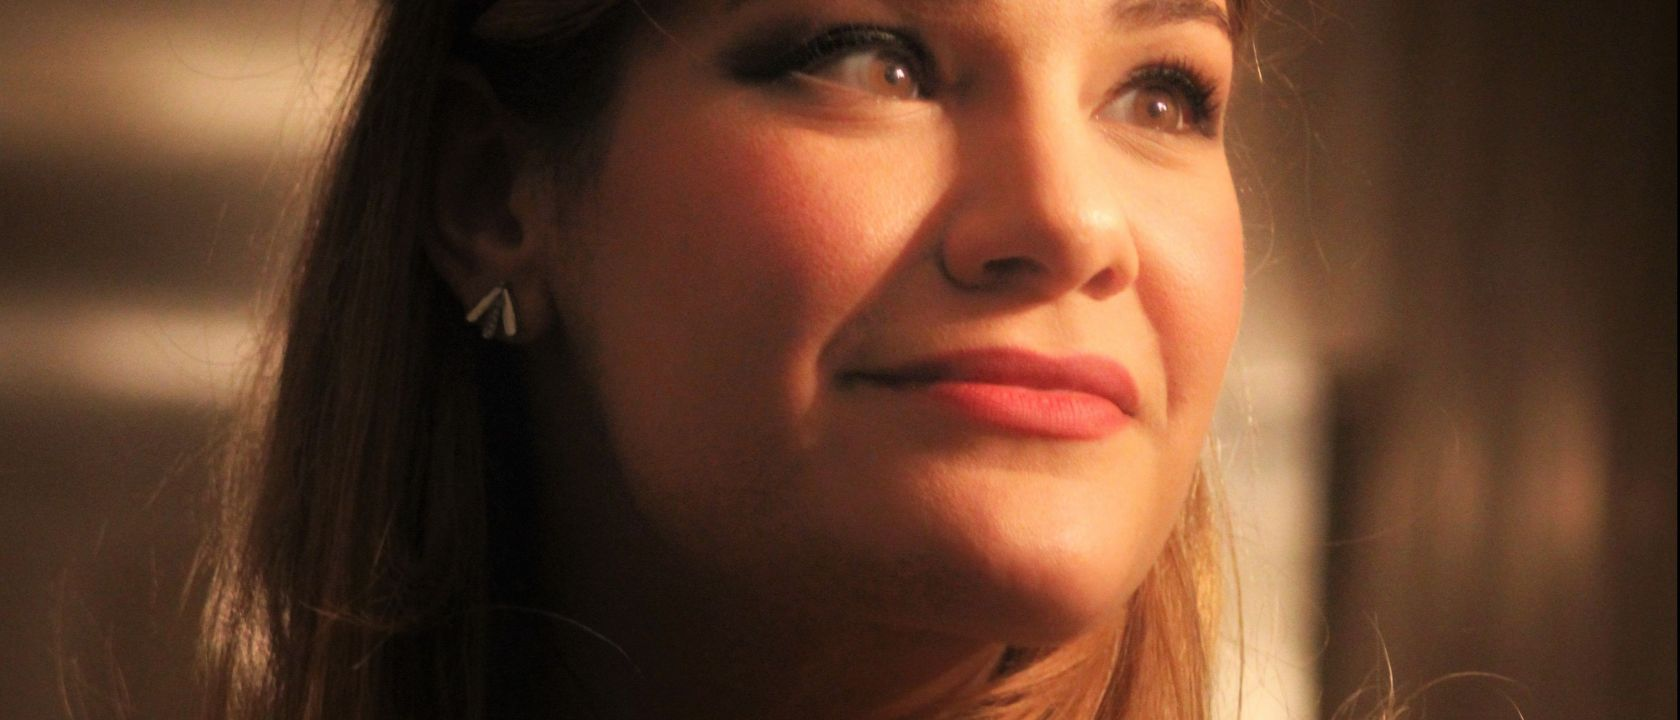 Tamara Bounazou Sängerin Sopran Teilnehmerin Young Singers Project